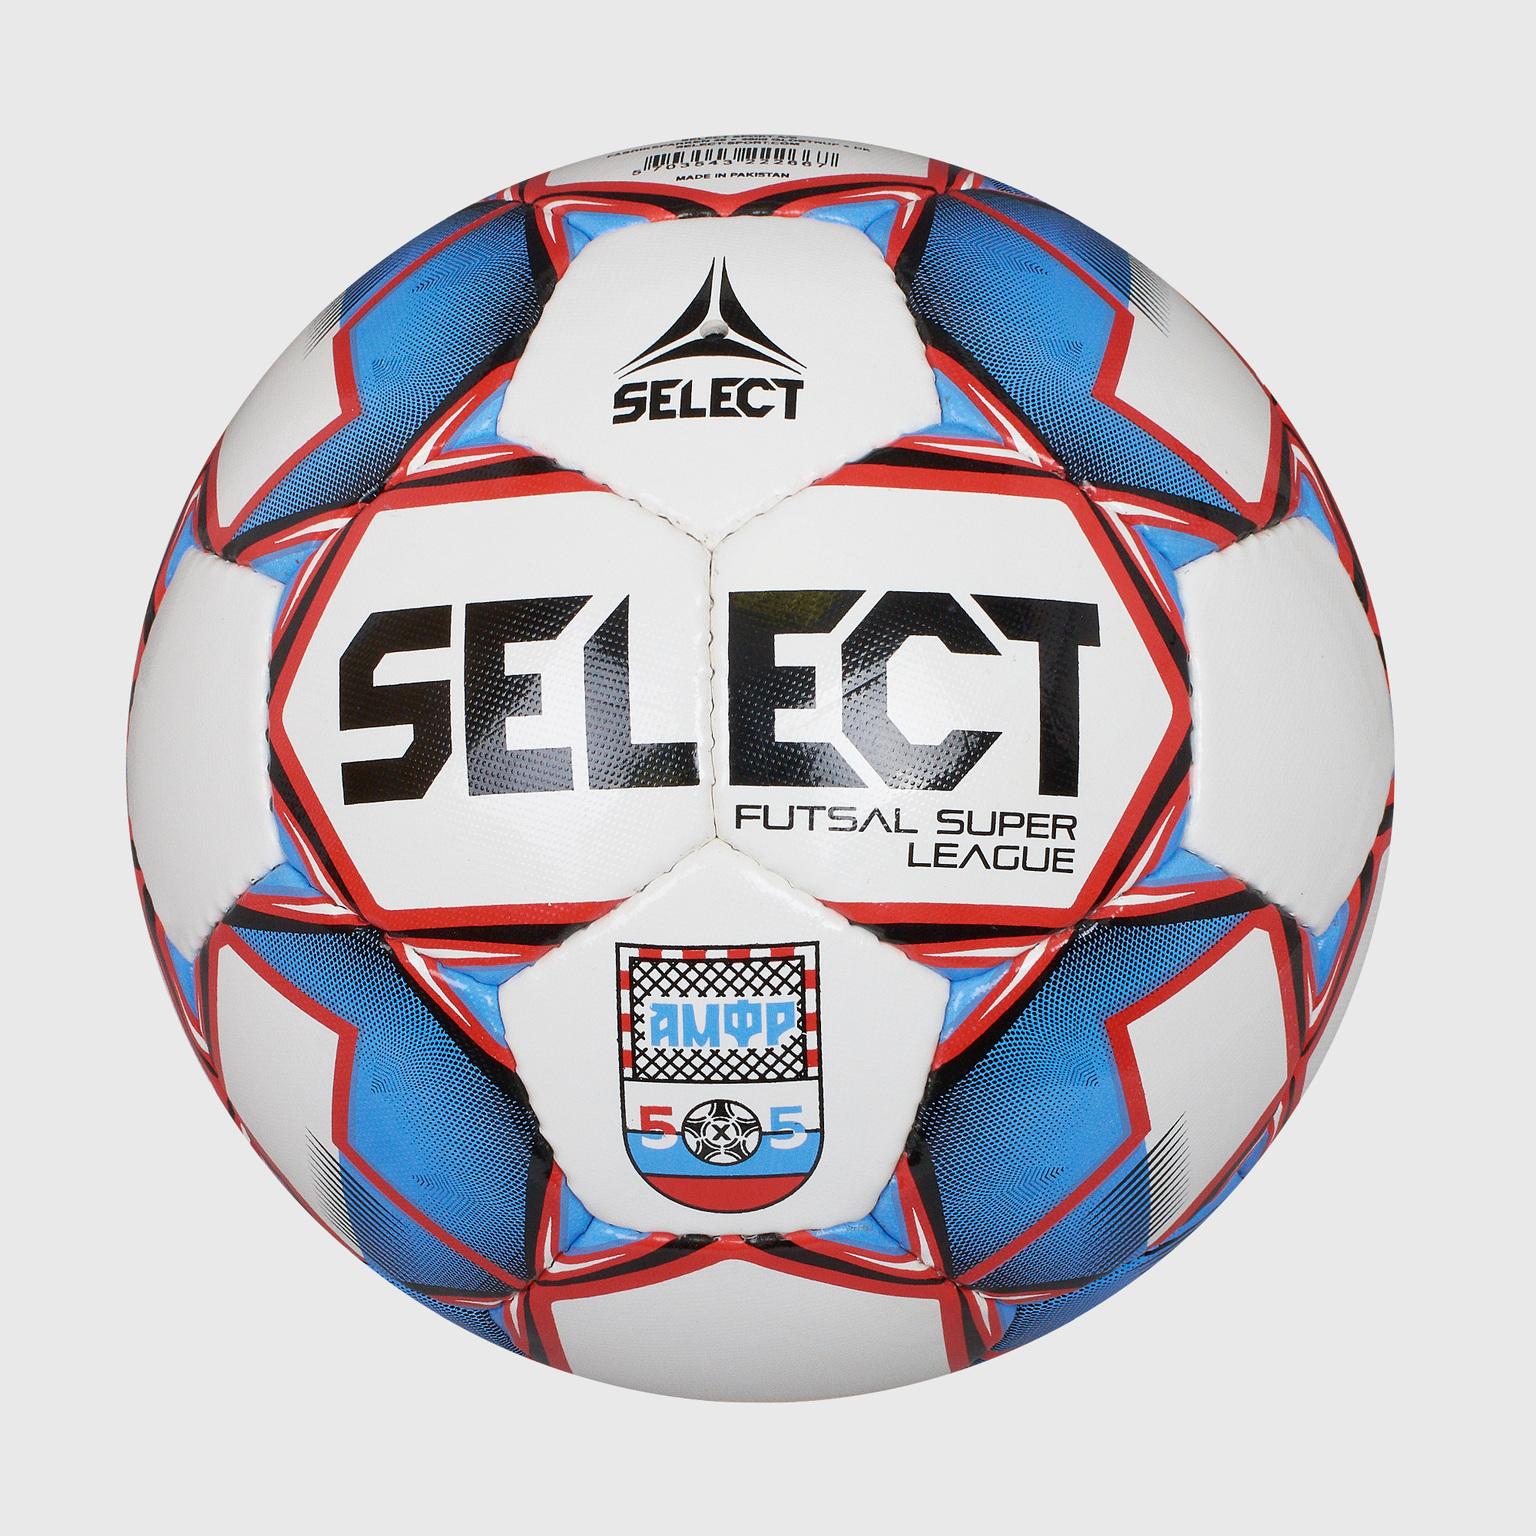 Футзальный мяч Select Super League АМФР РФС FIFA 850718-172